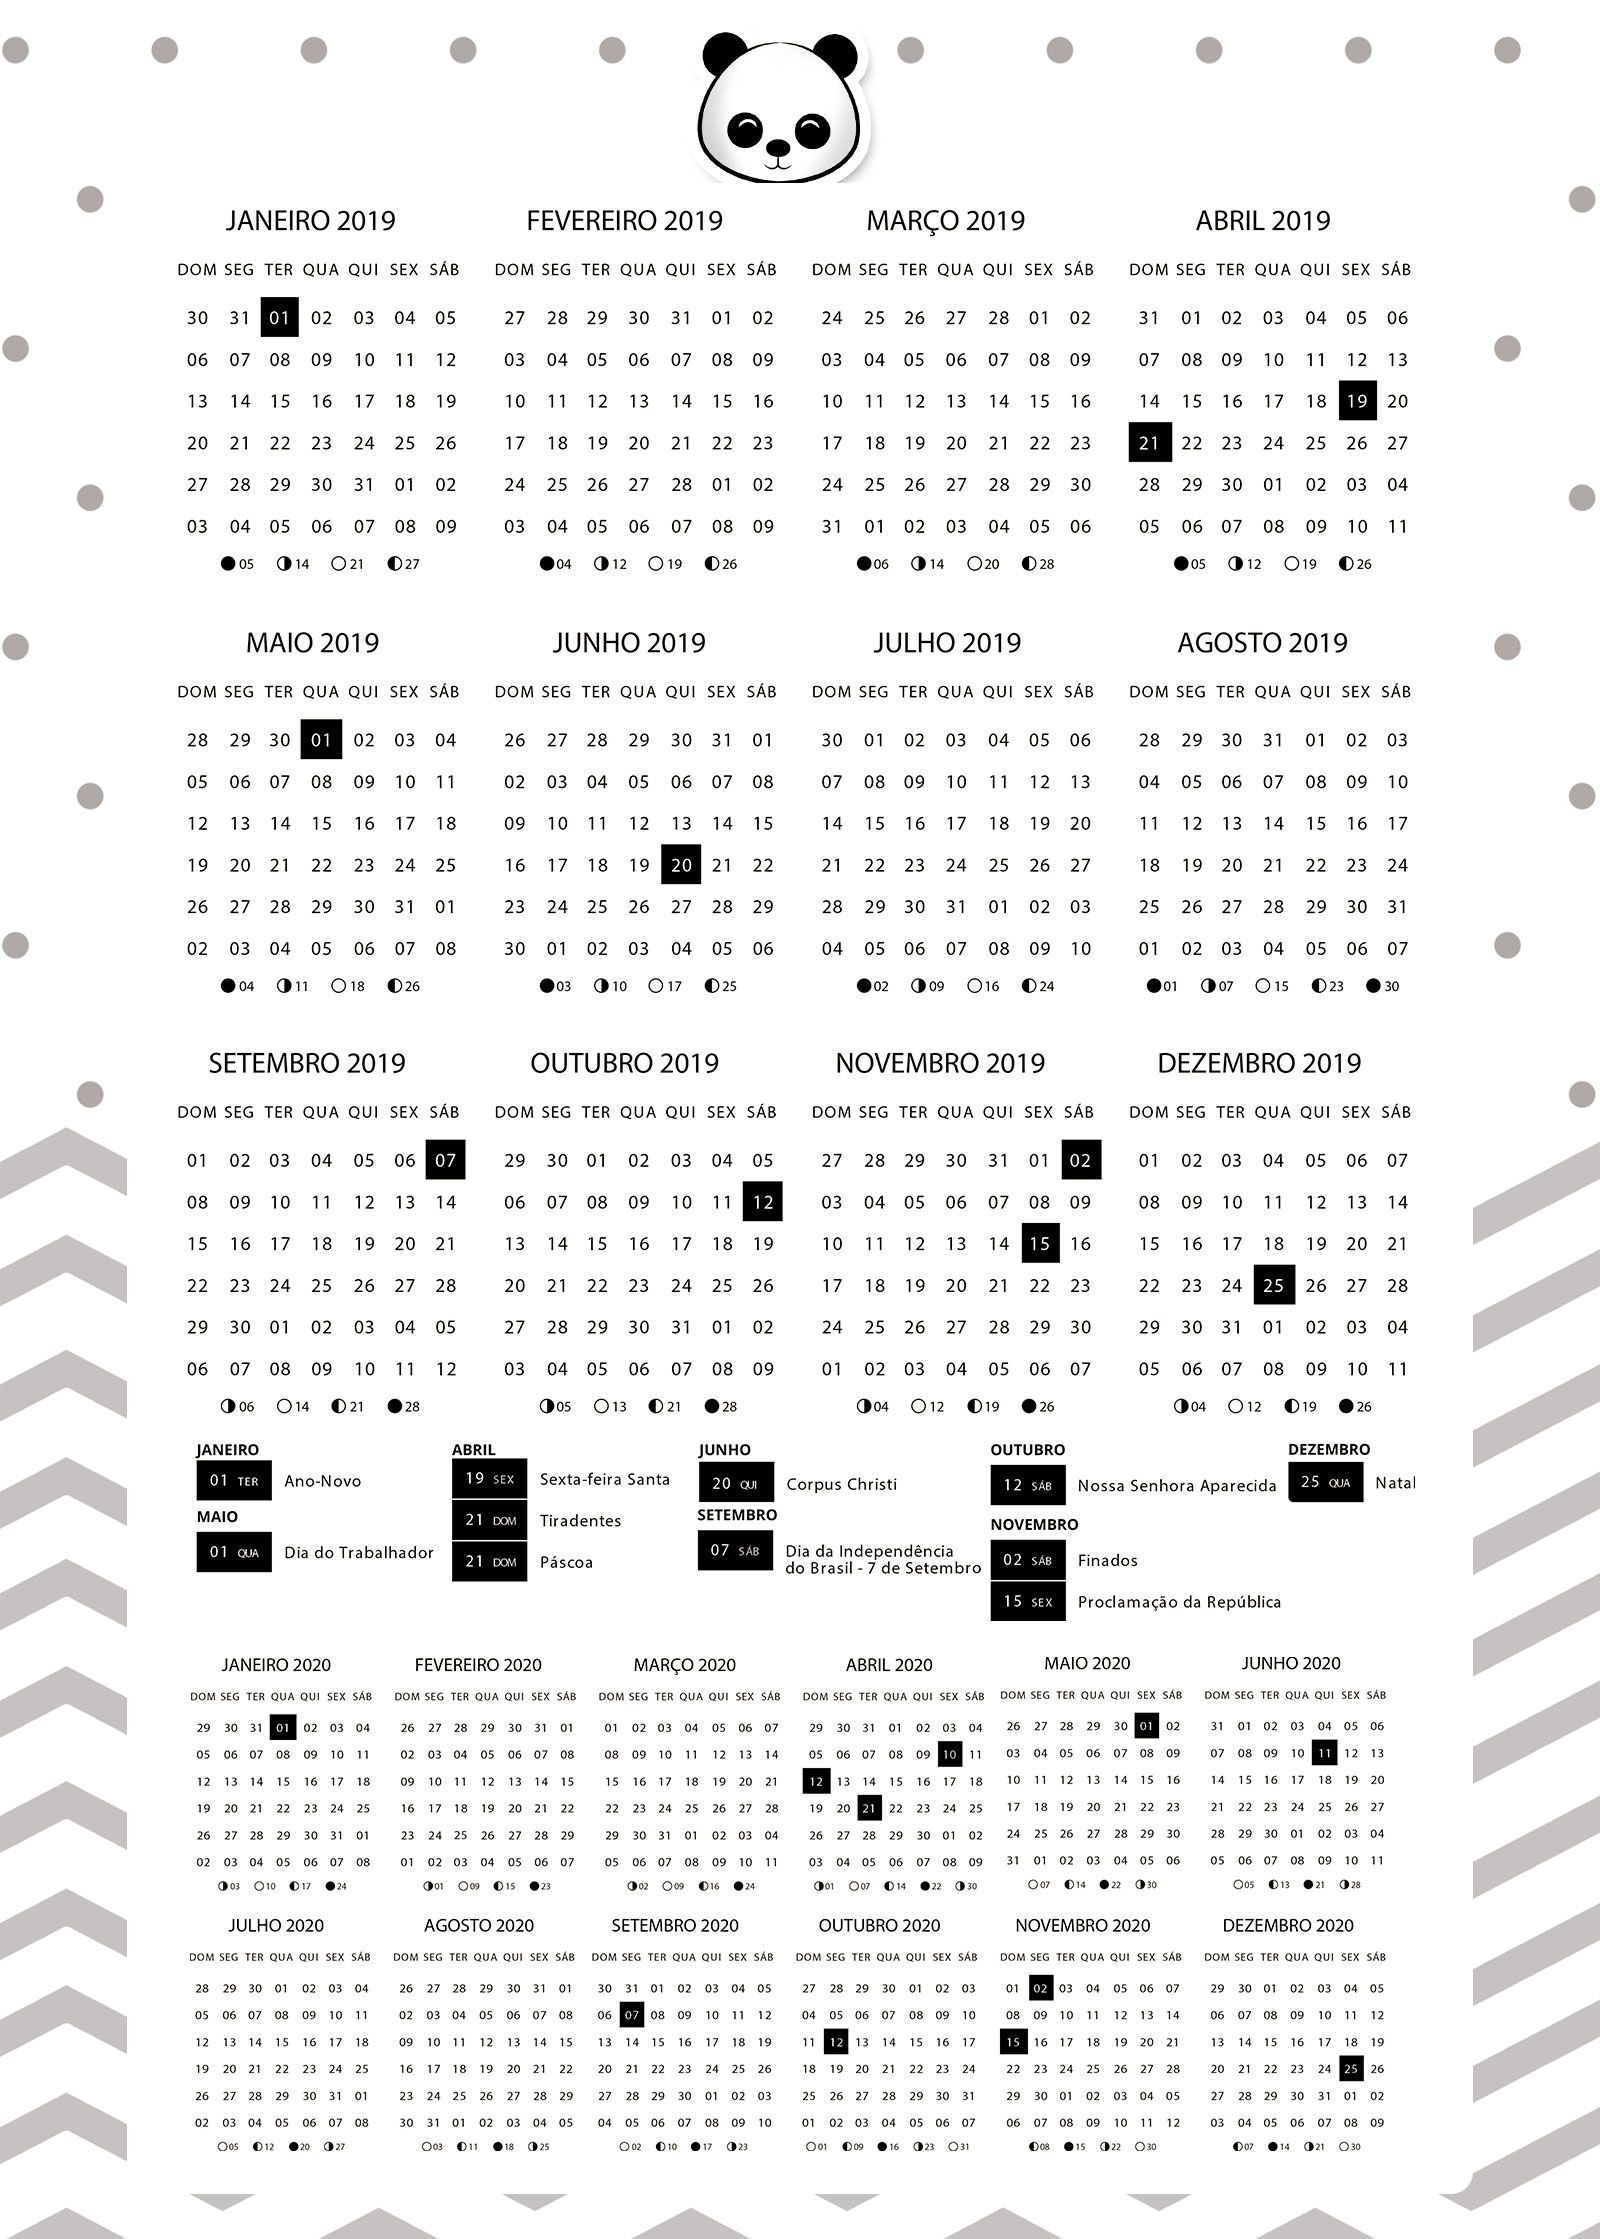 Calendario 2019 Junho Más Arriba-a-fecha Planner 2019 Panda Menino Calendario 2019 E 2020 Of Calendario 2019 Junho Más Arriba-a-fecha Index Of Midia